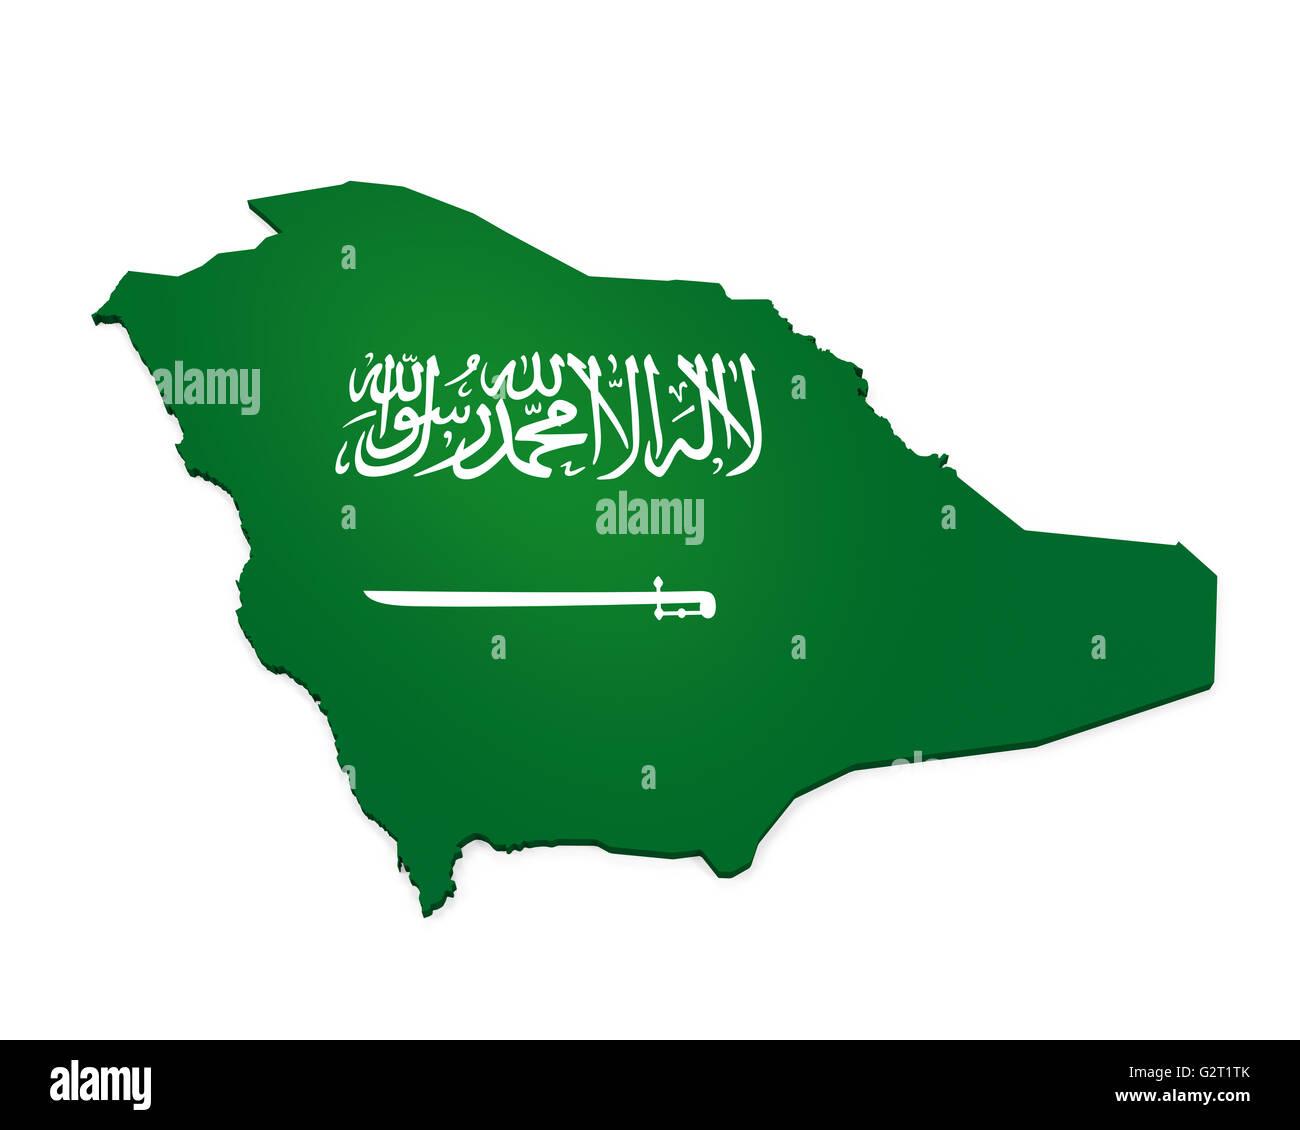 Saudi Arabia Map - Stock Image